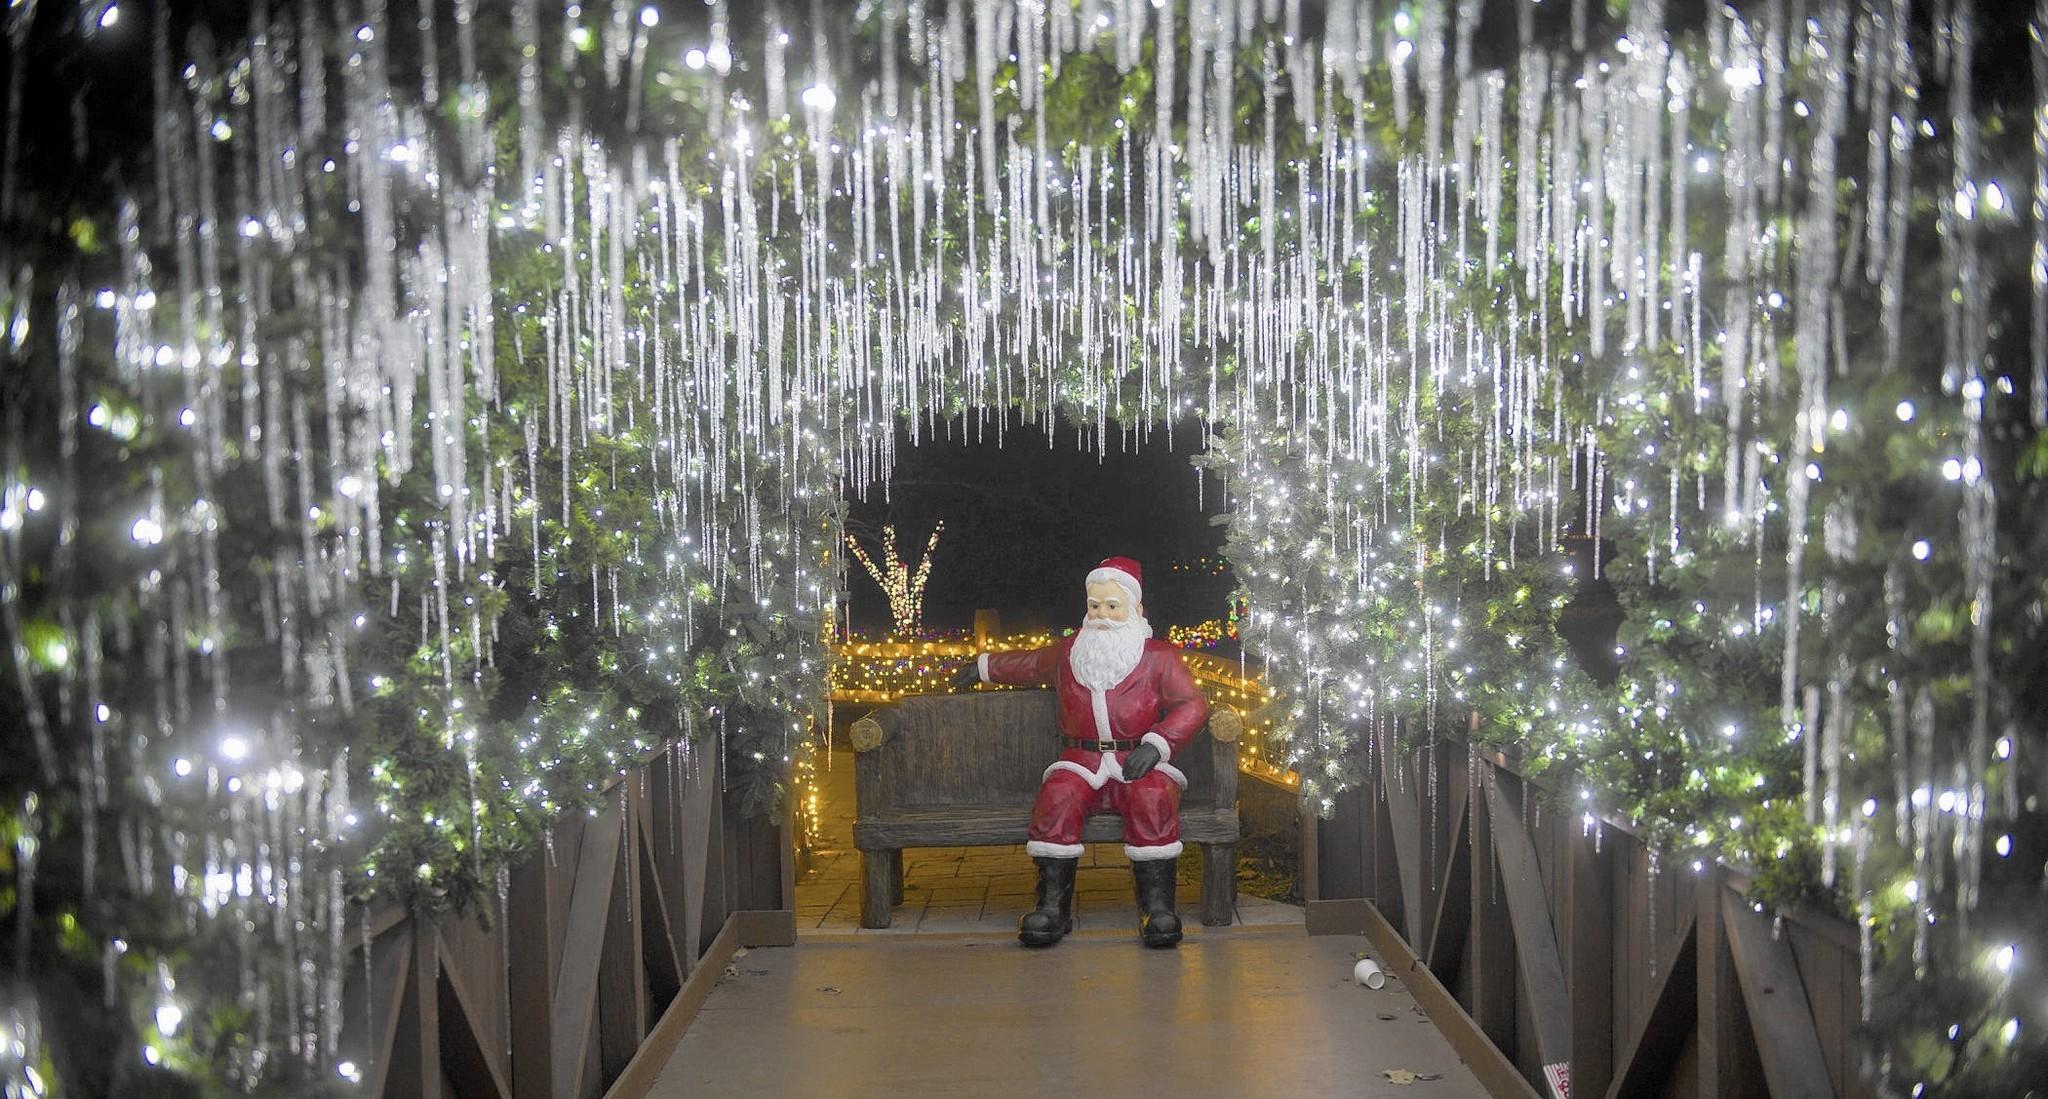 Lehigh Valley Zoos Winter Light Spectacular Shines